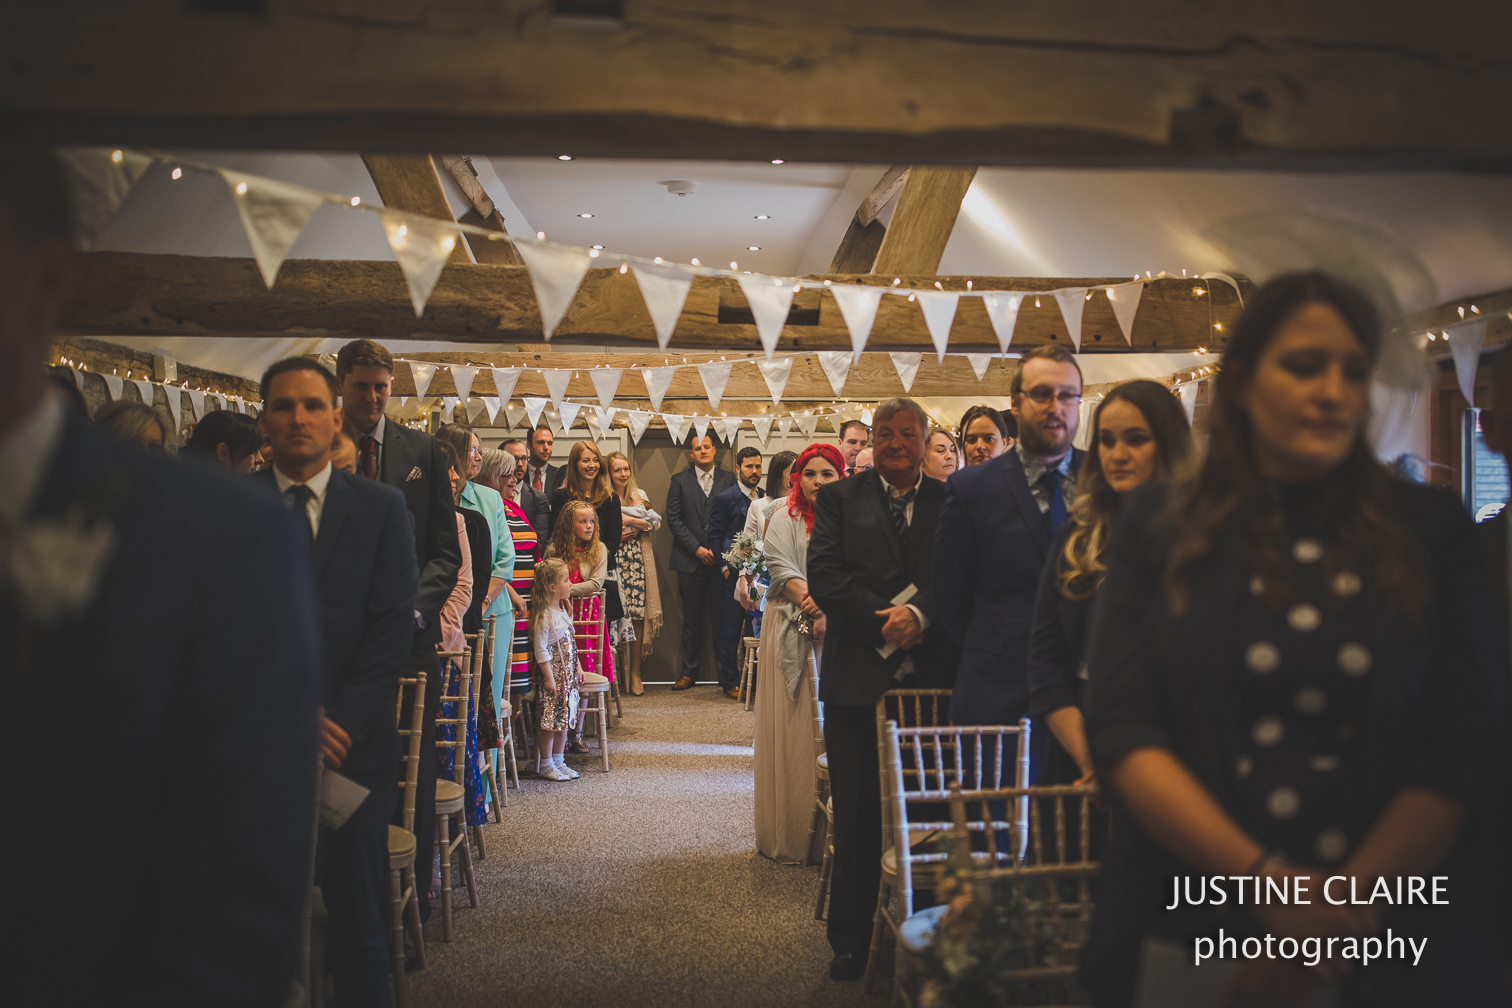 Fitzleroi Fittleworth petworth Billingshurst farm Wedding Photography by Justine Claire photographer Arundel Worthing Brighton-17.jpg